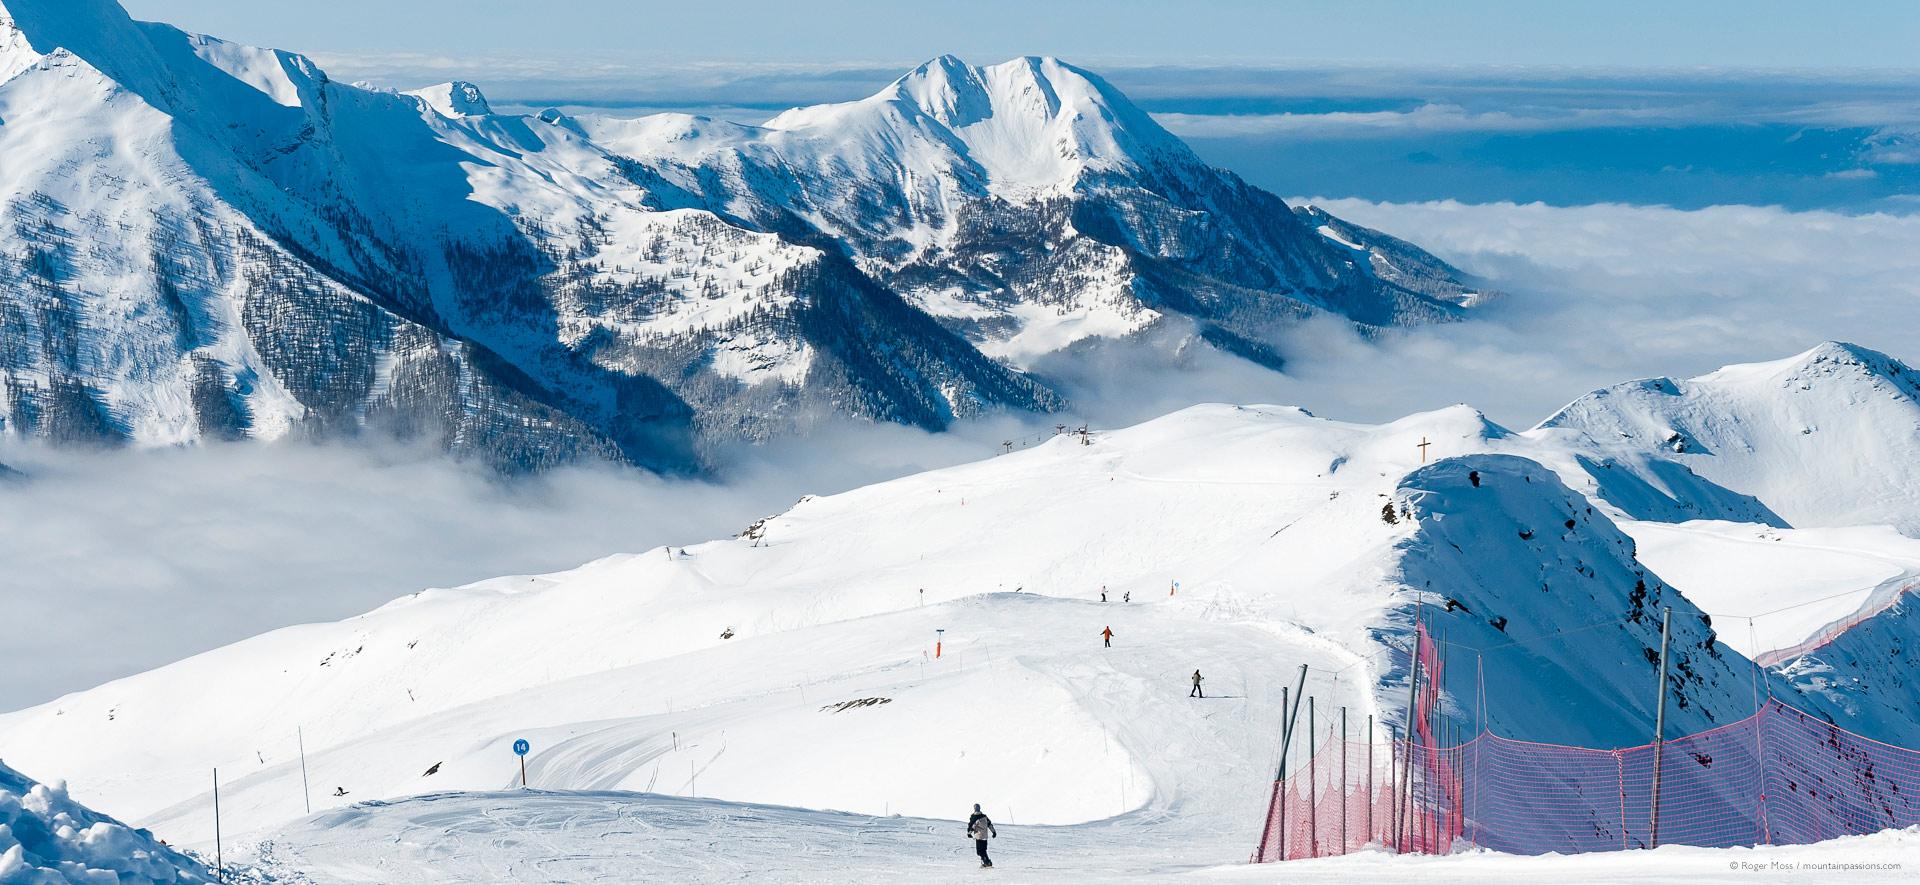 High view of ski terrain, showing mountain scenery